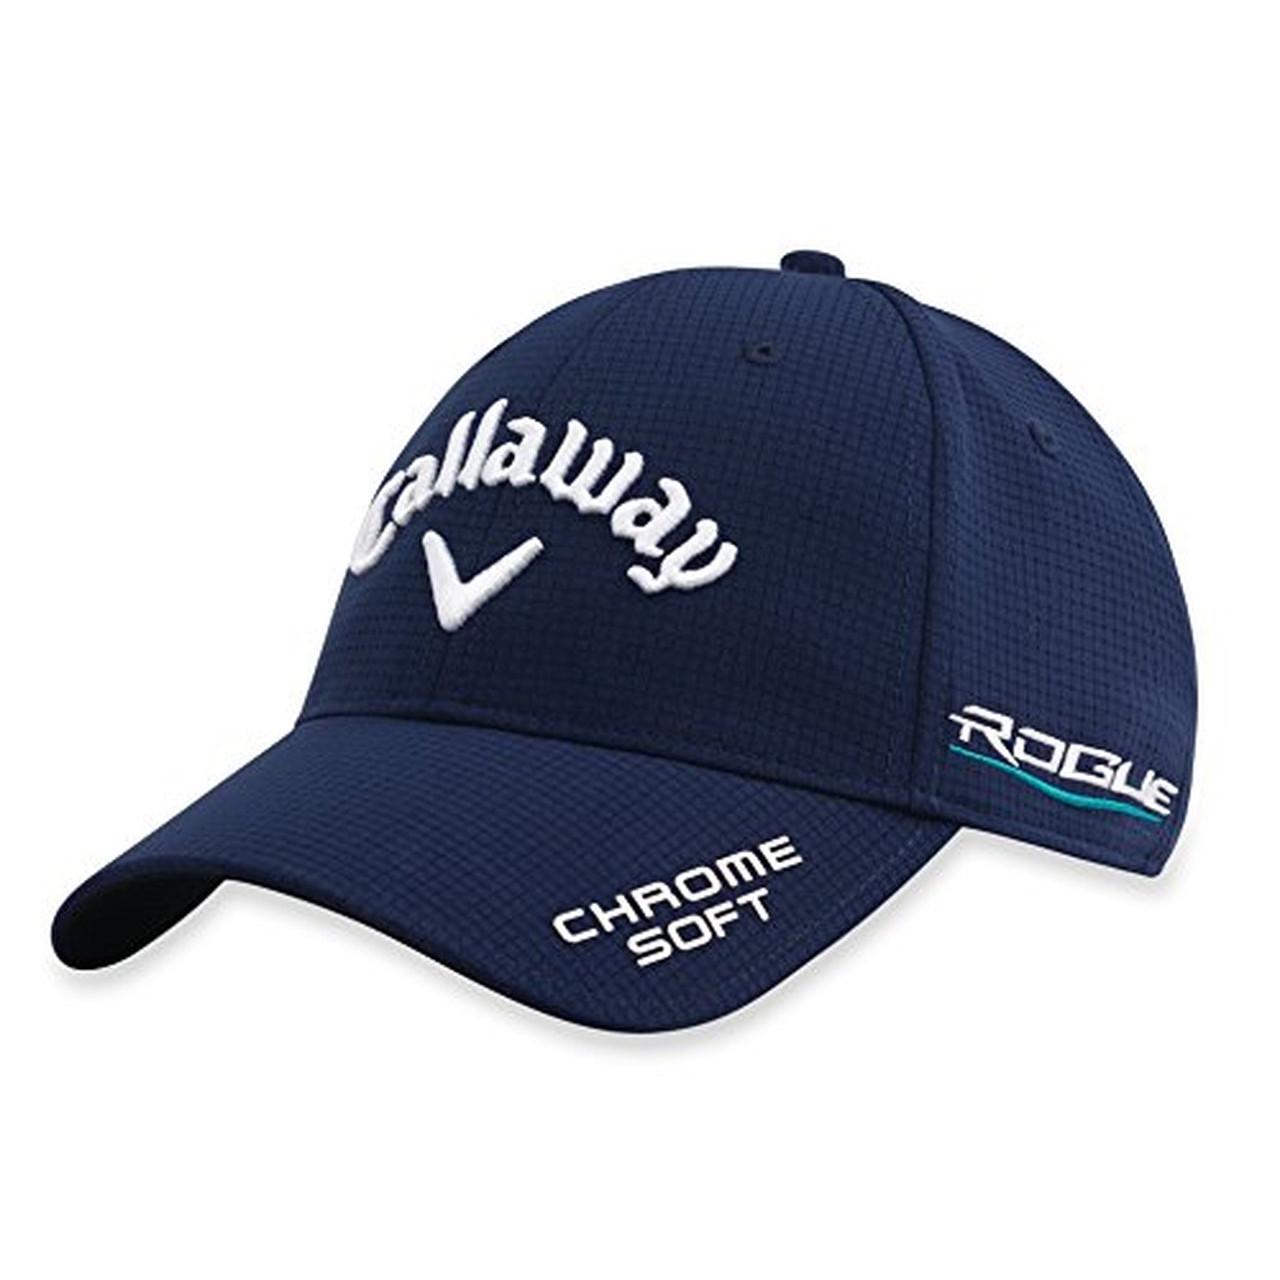 Callaway TA Performance Pro Rogue Cap - Navy